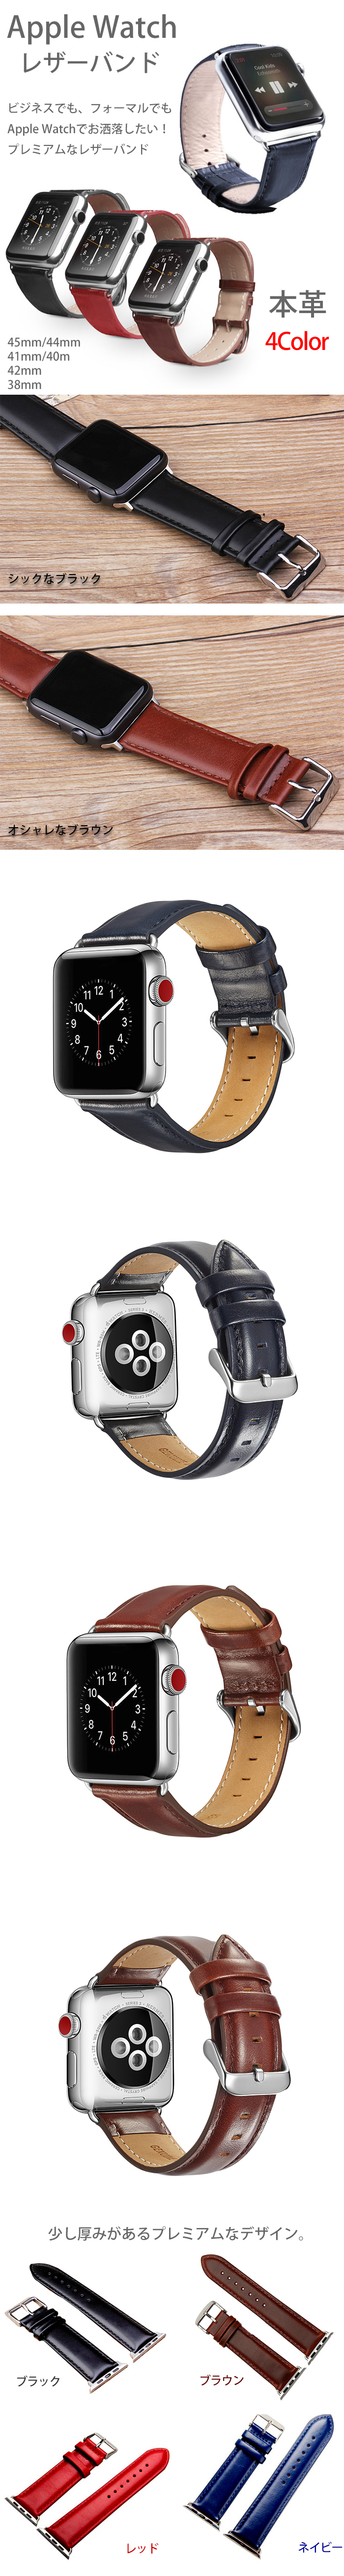 Apple watch バンド レザー 44mm 42mm 40mm 38mm Series4 Series3 Series2 Series1 ベルト 本革 レザーバンド レザーベルト applewatch Series 4 3 2 1 対応 アップルウォッチ オシャレ 本革バンド 本革ベルト 送料無料